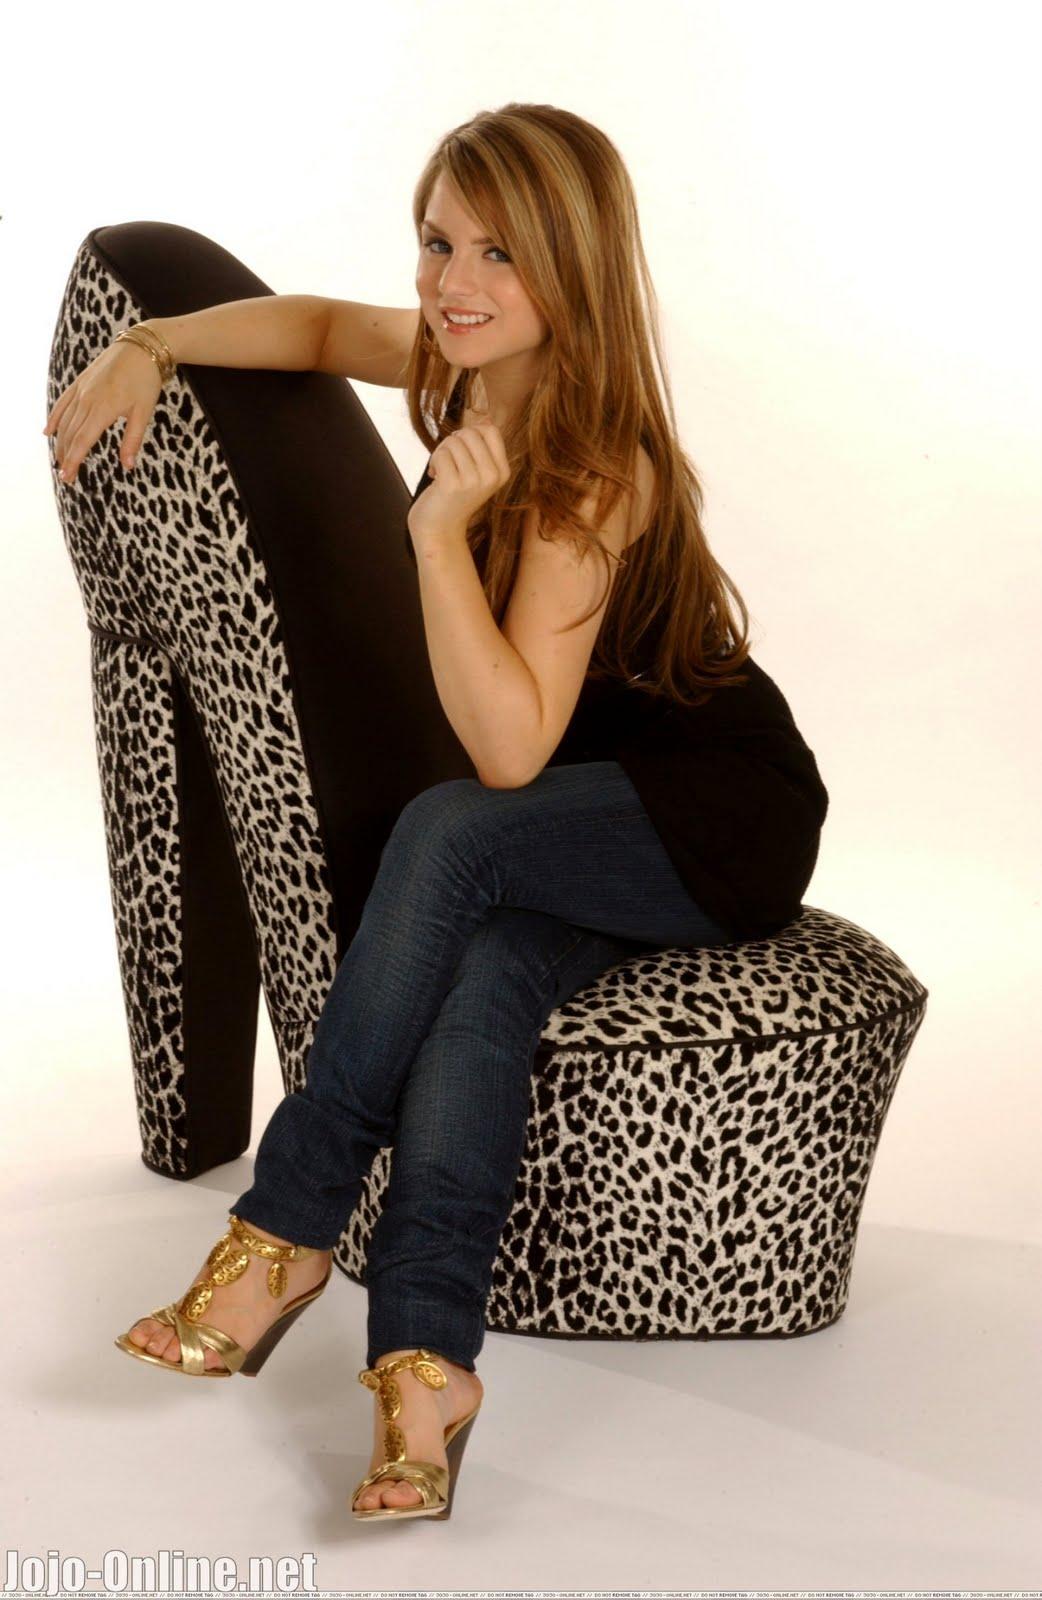 6aecad64aba23 Glamour Fashion  jojoanthony Celebrity Singer Jojo free download ...